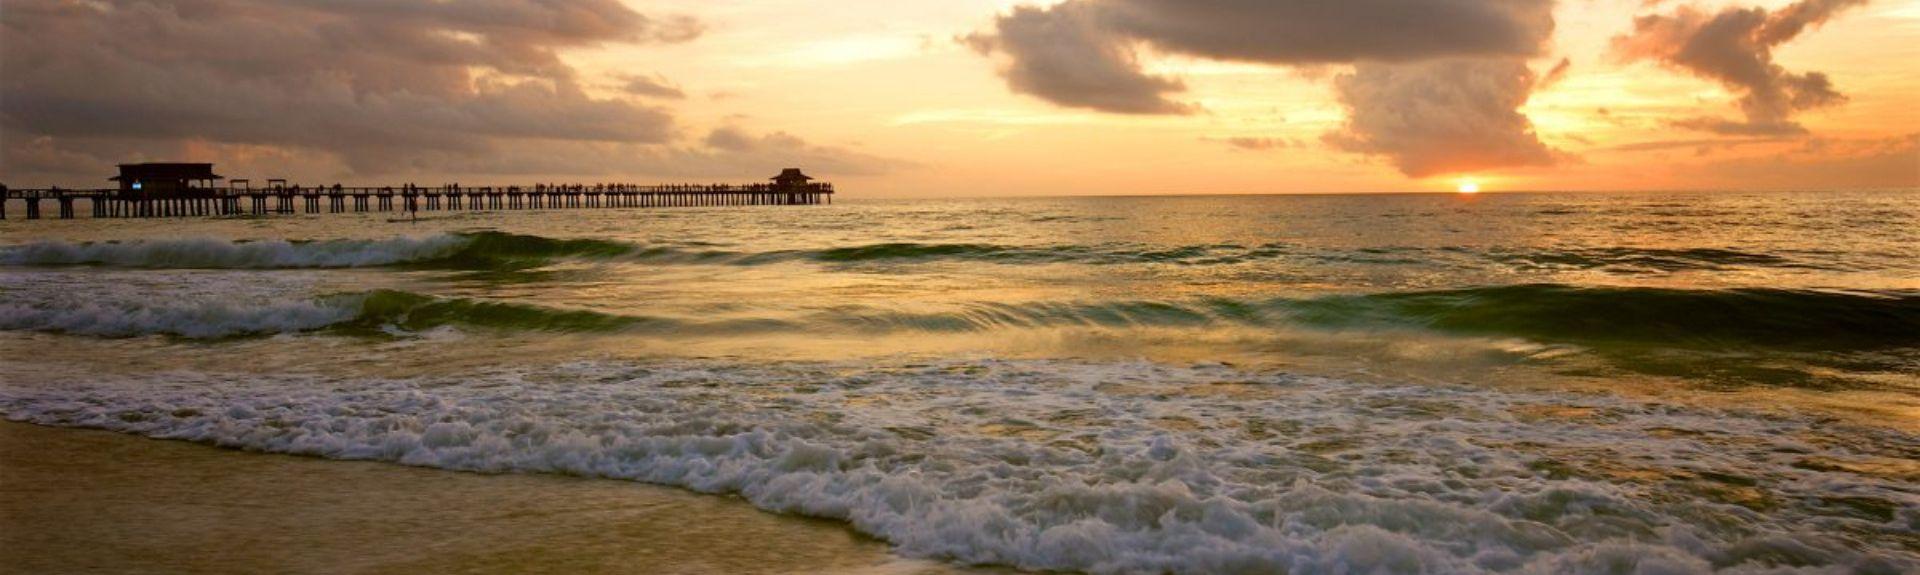 Anglers Cove, Marco Island, Florida, United States of America